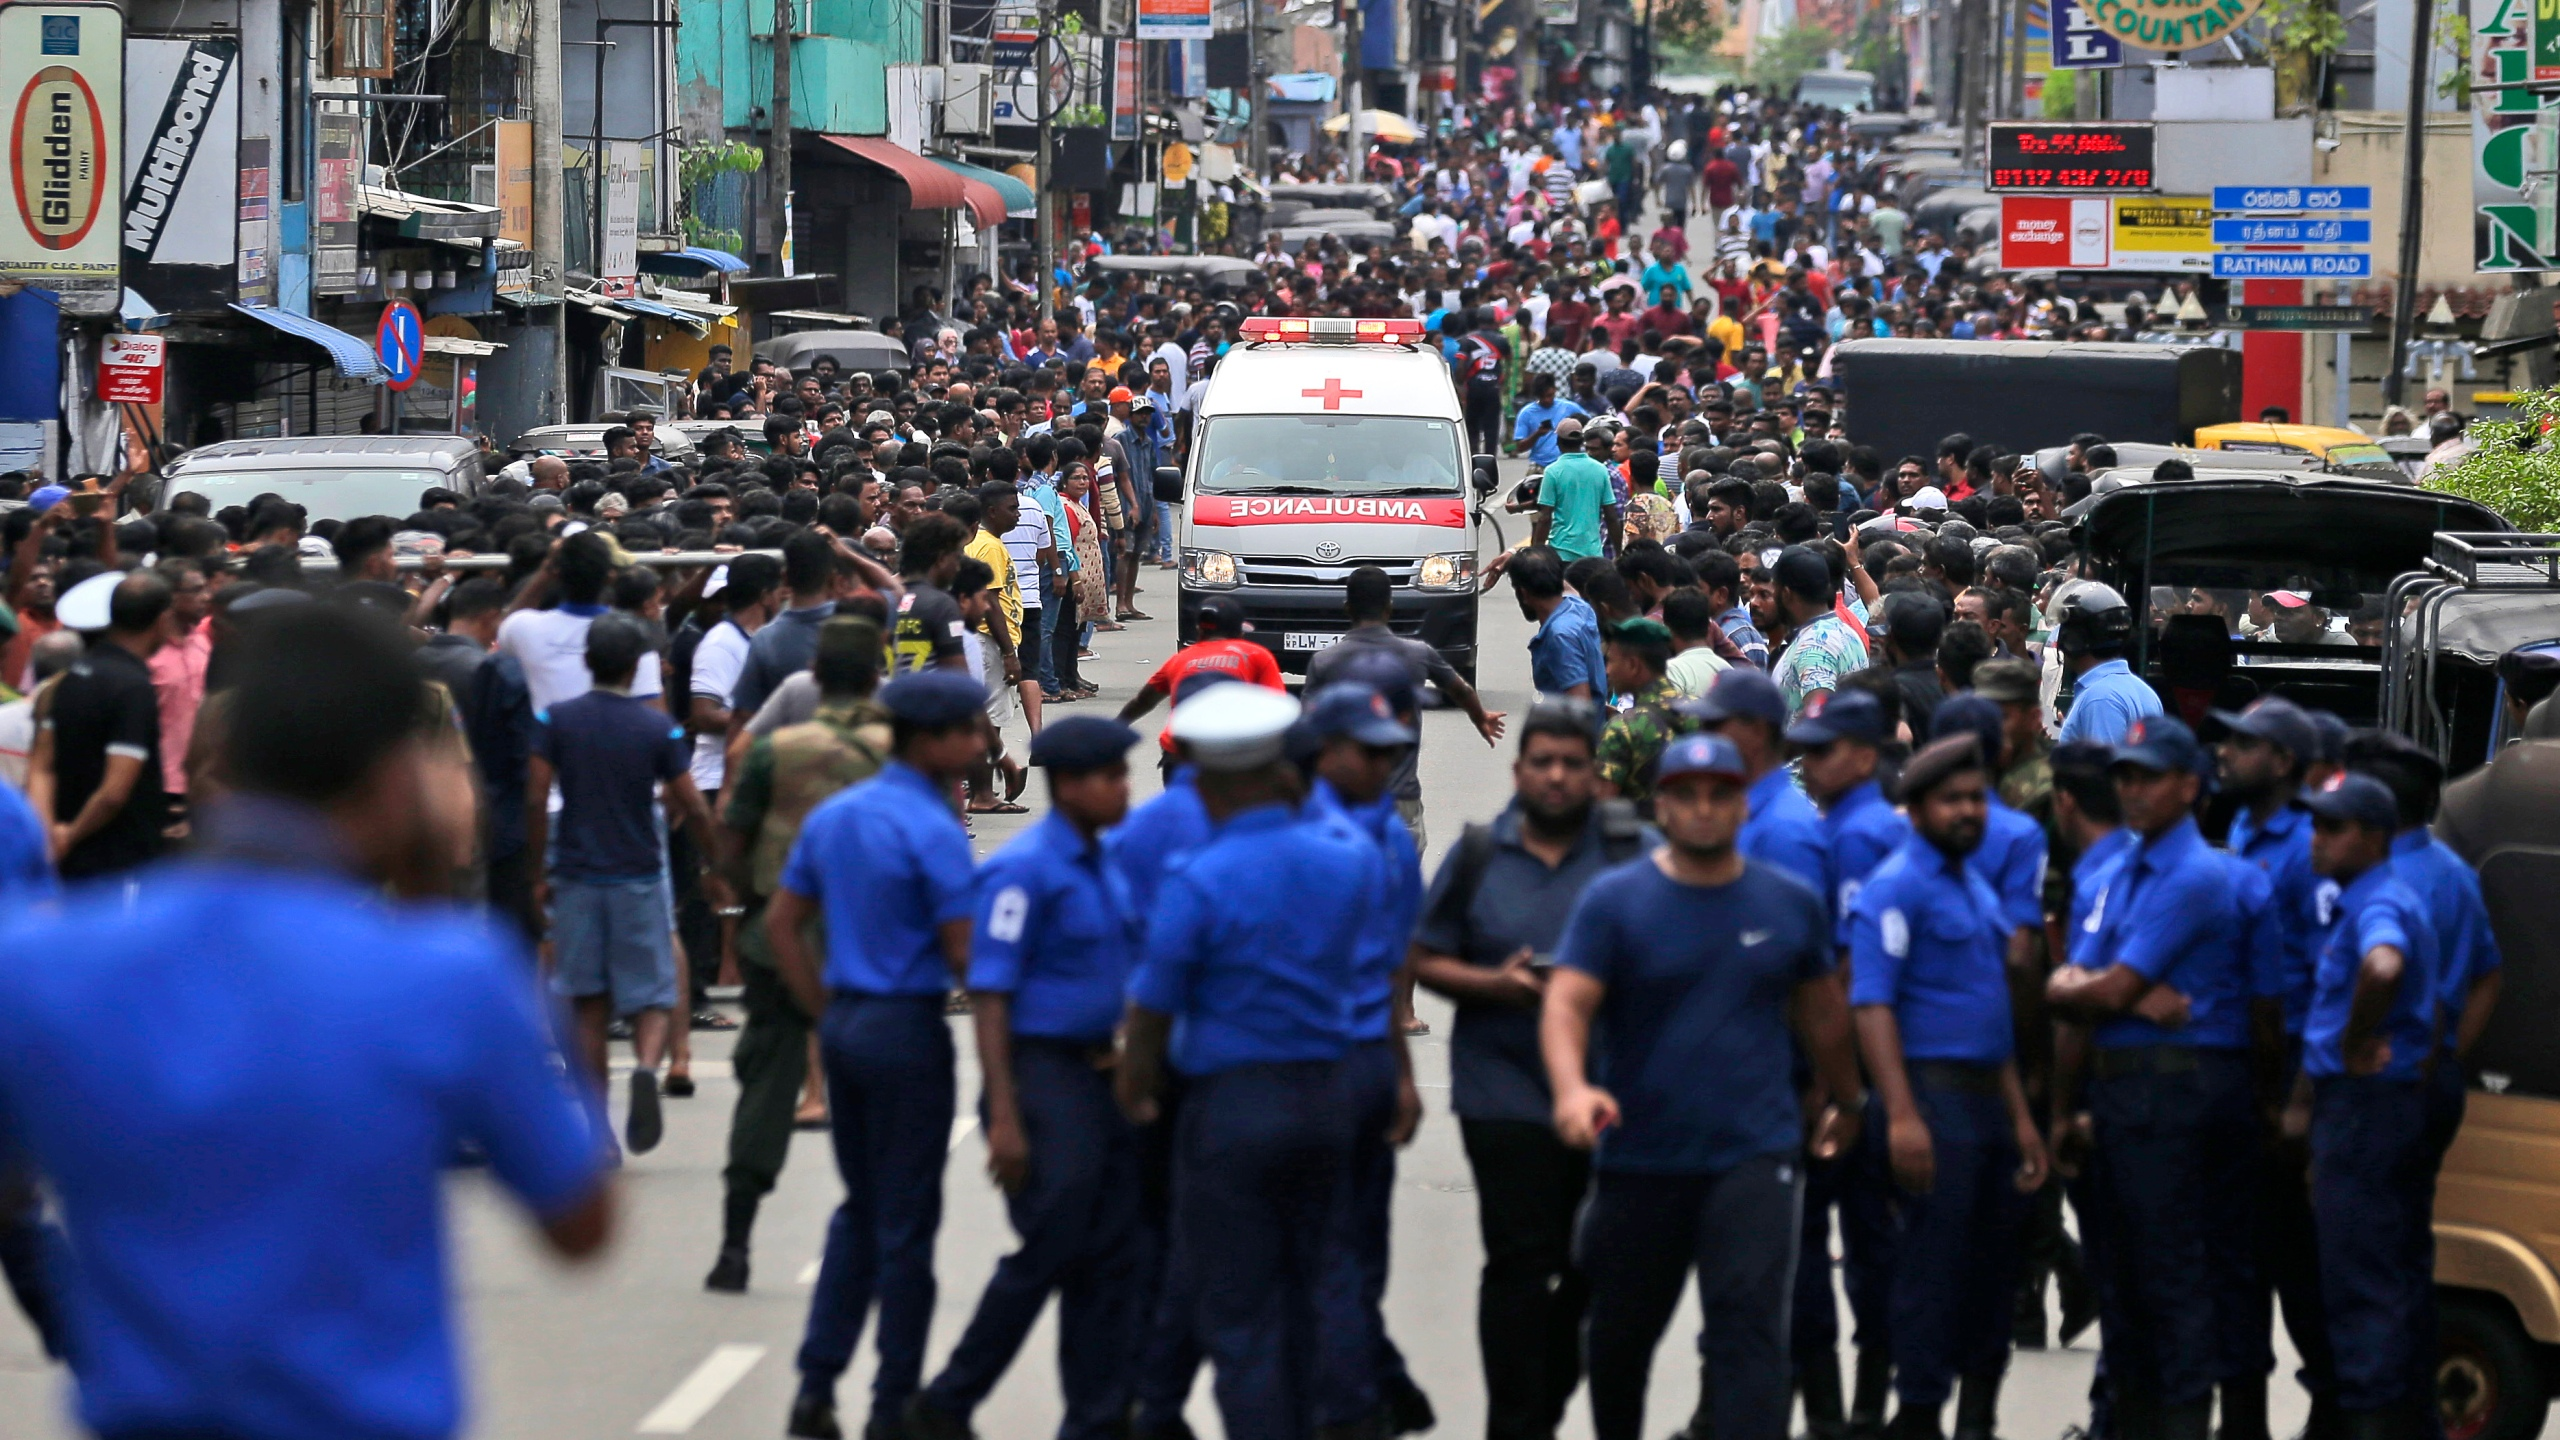 Sri_Lanka_Church_Blasts_46072-159532.jpg47350686